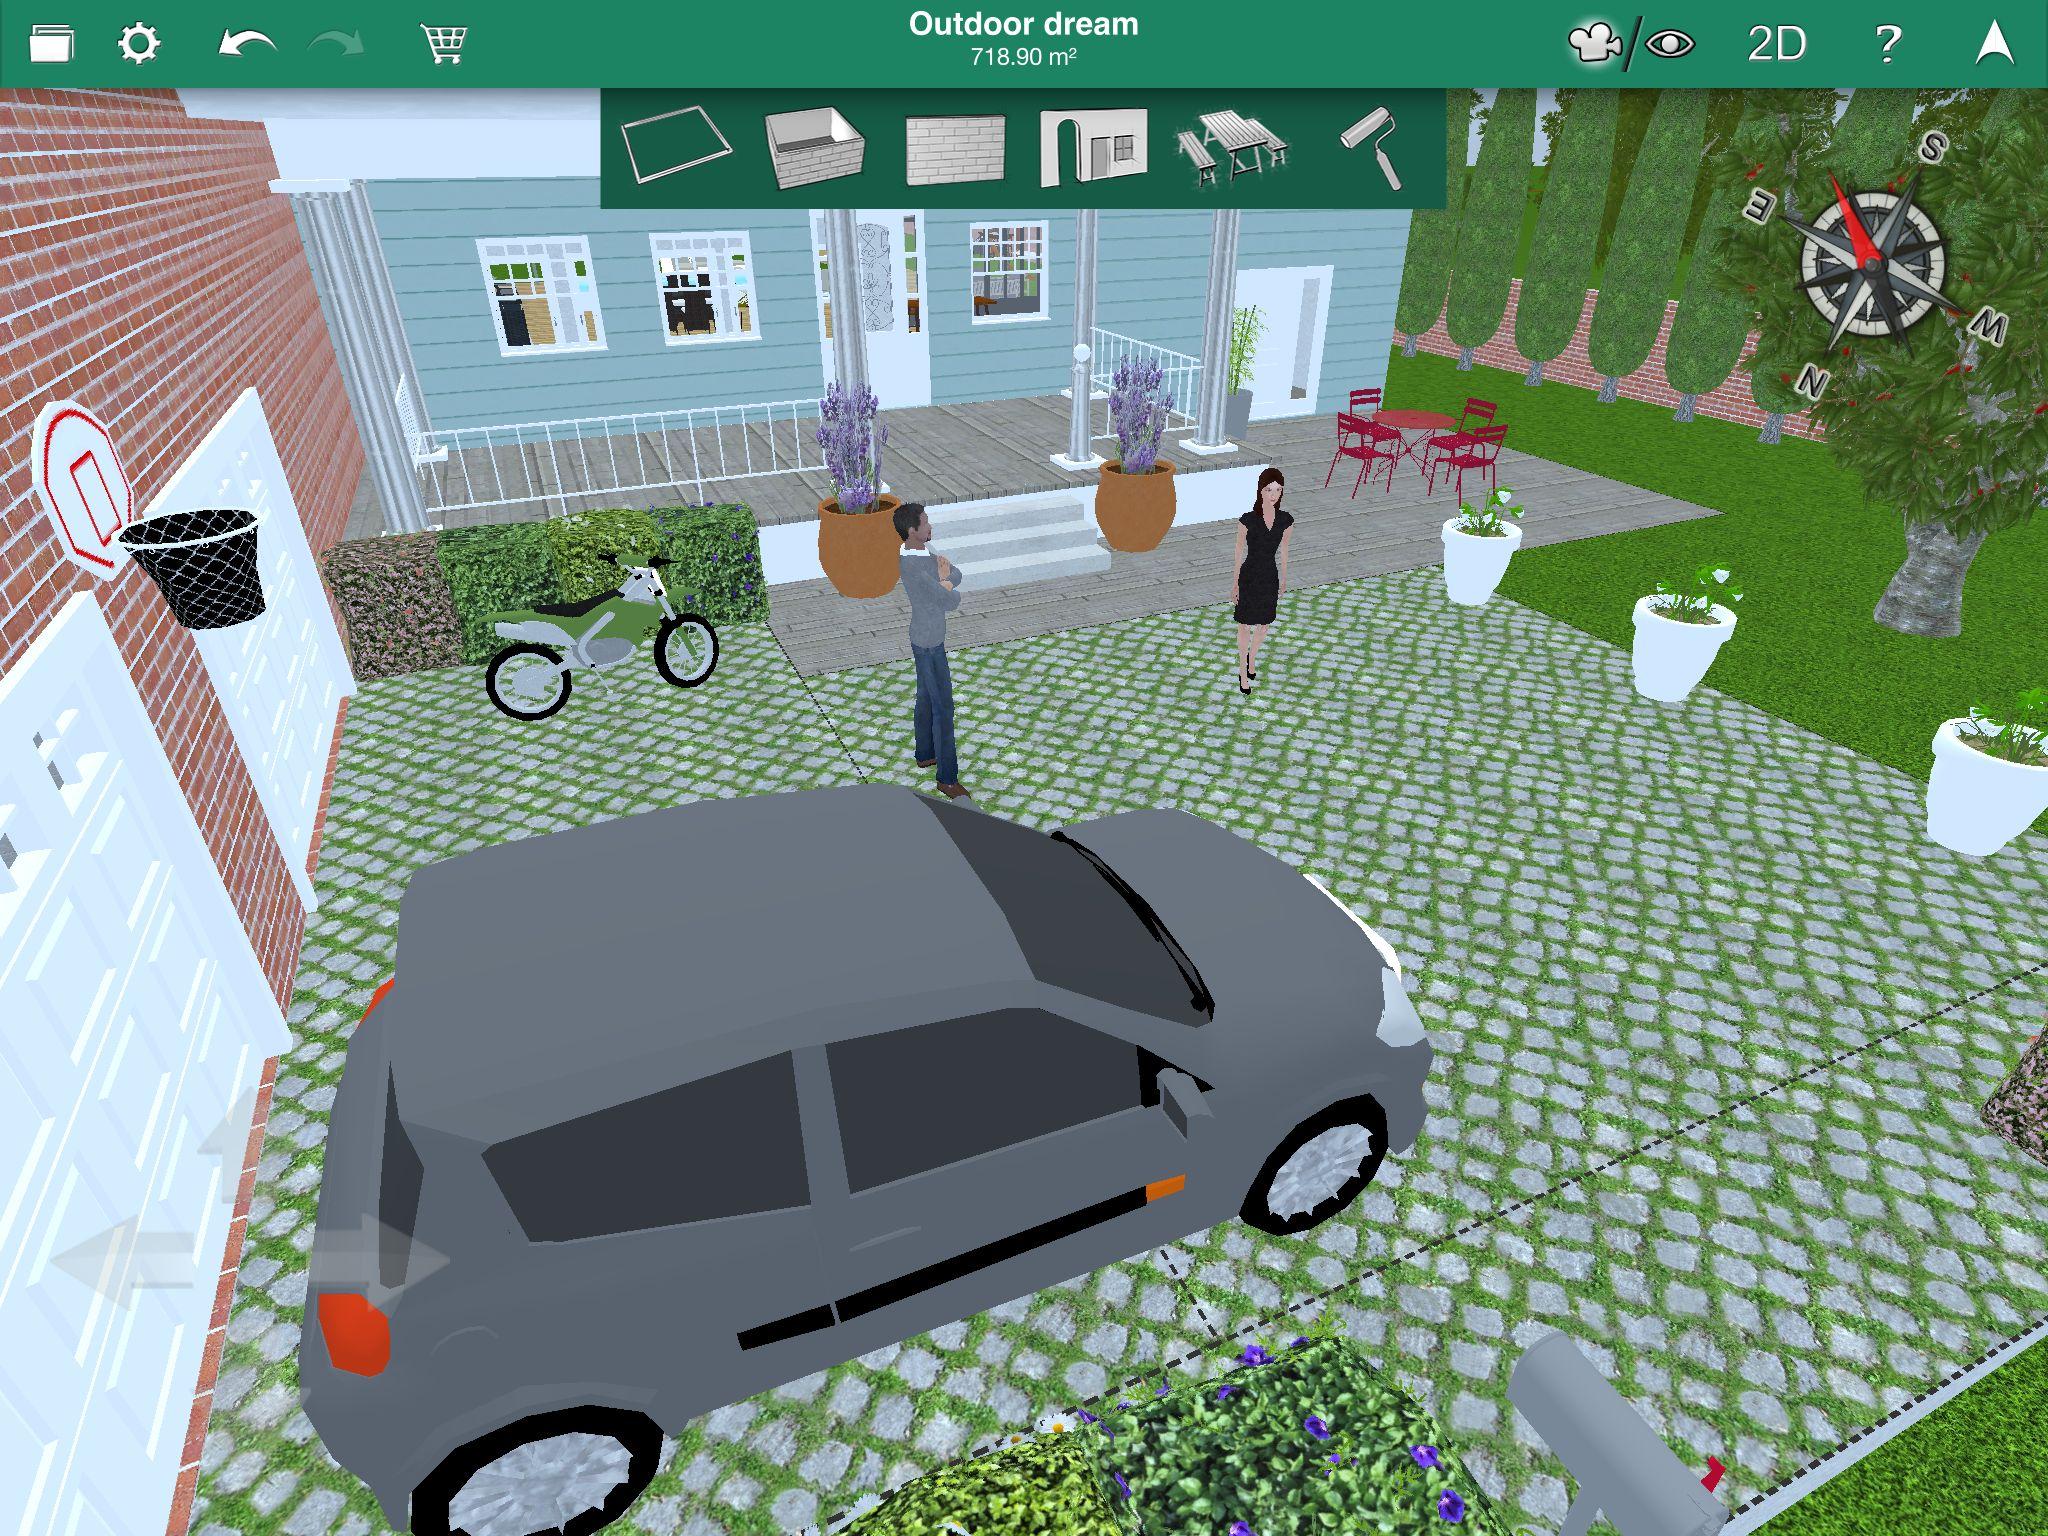 Buy home design 3d outdoor garden cd key at the best price for Home design 3d outdoor garden gratuit